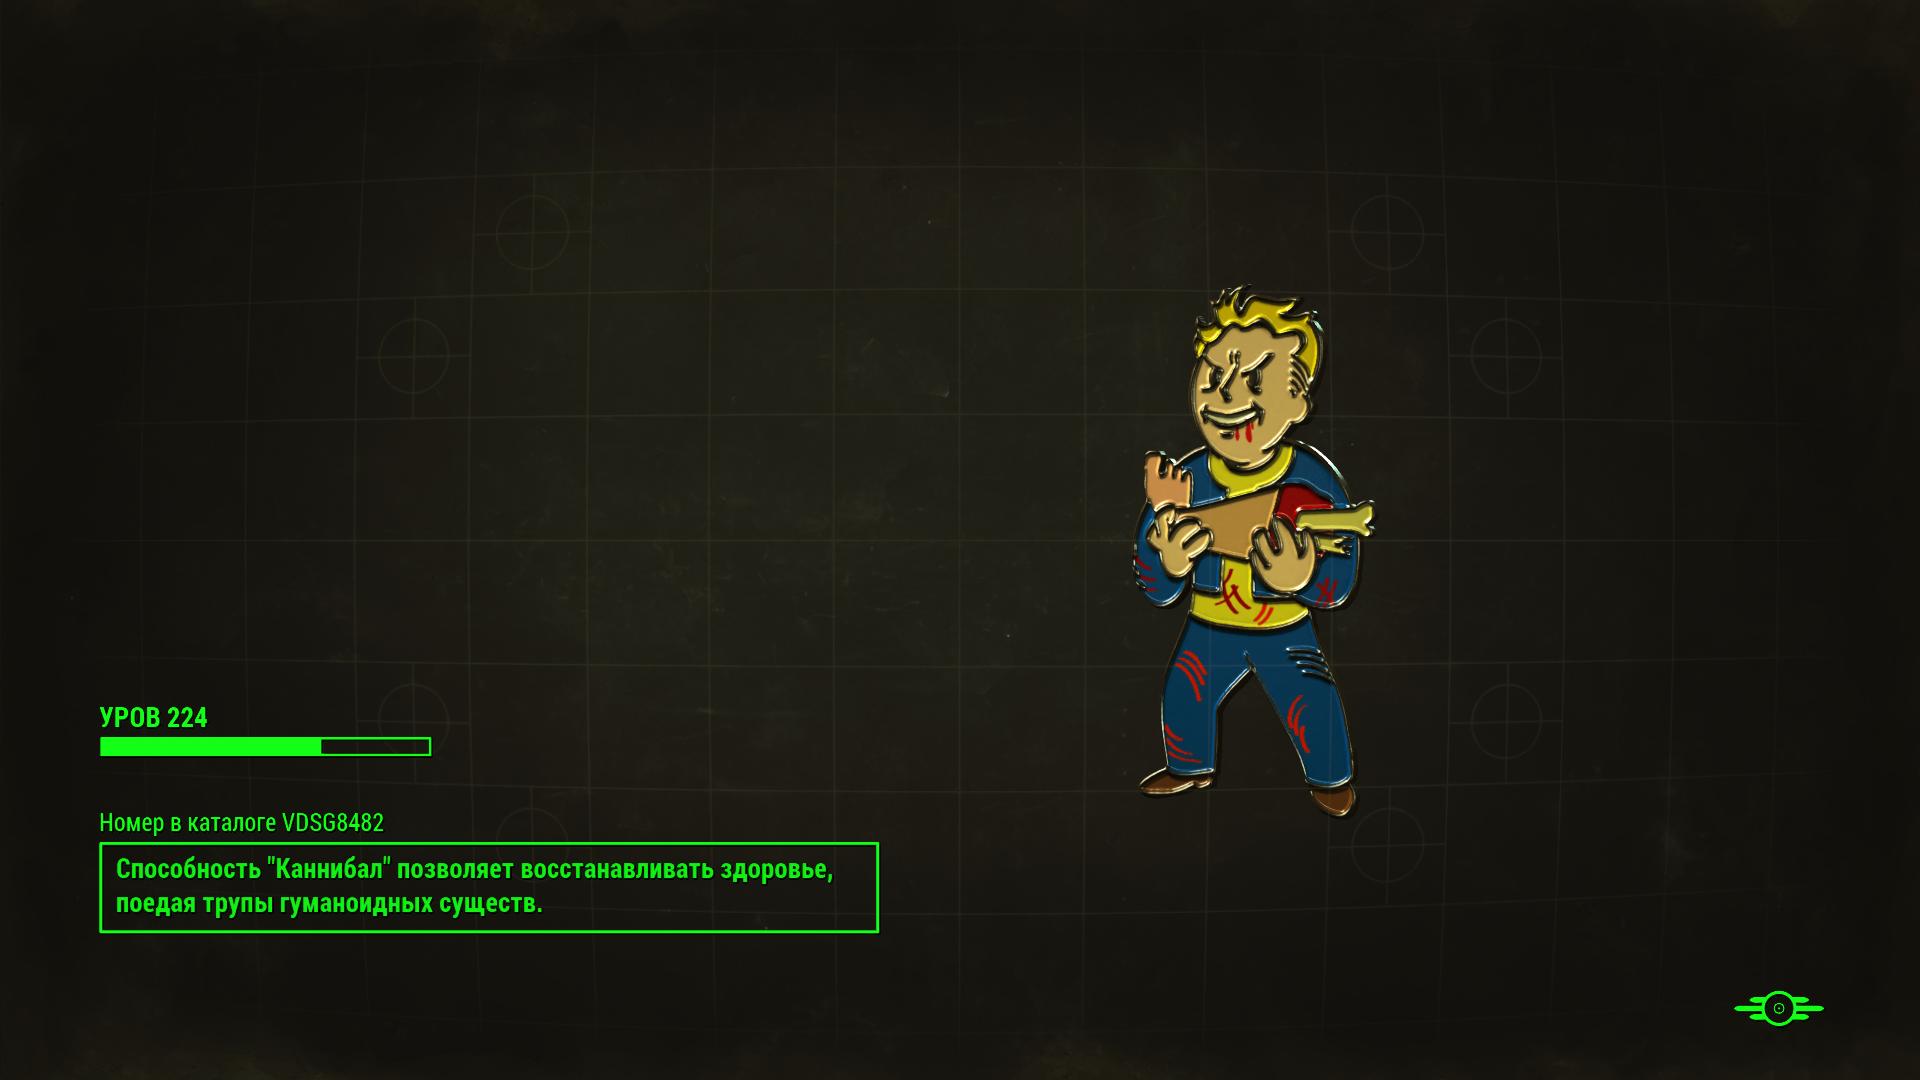 Каннибал (Fallout 4)